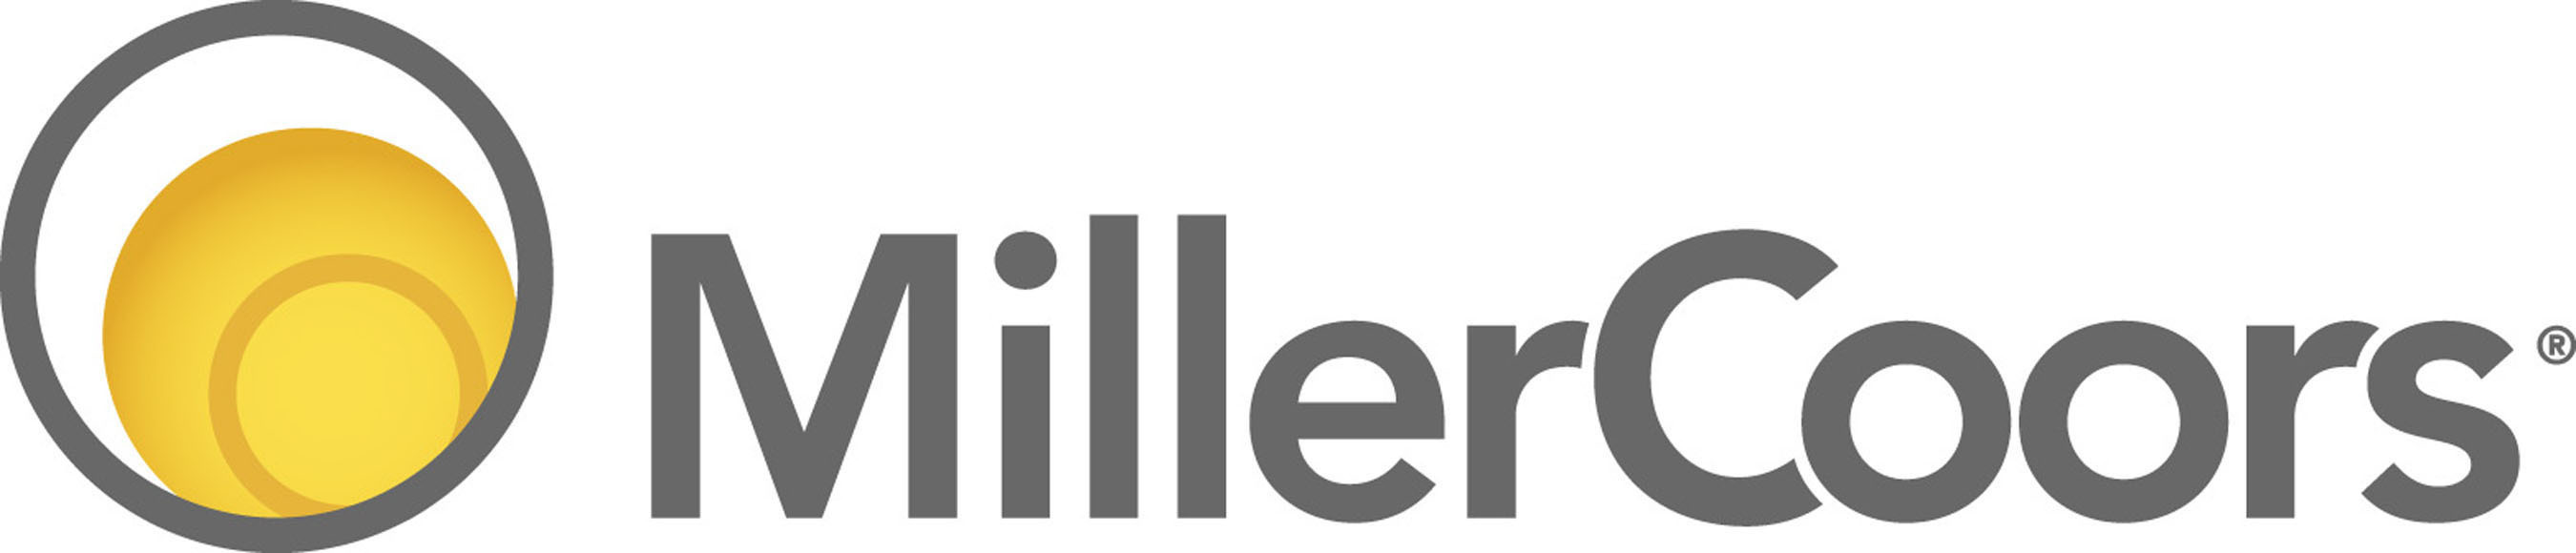 MillerCoors. (PRNewsFoto/MillerCoors) (PRNewsFoto/)